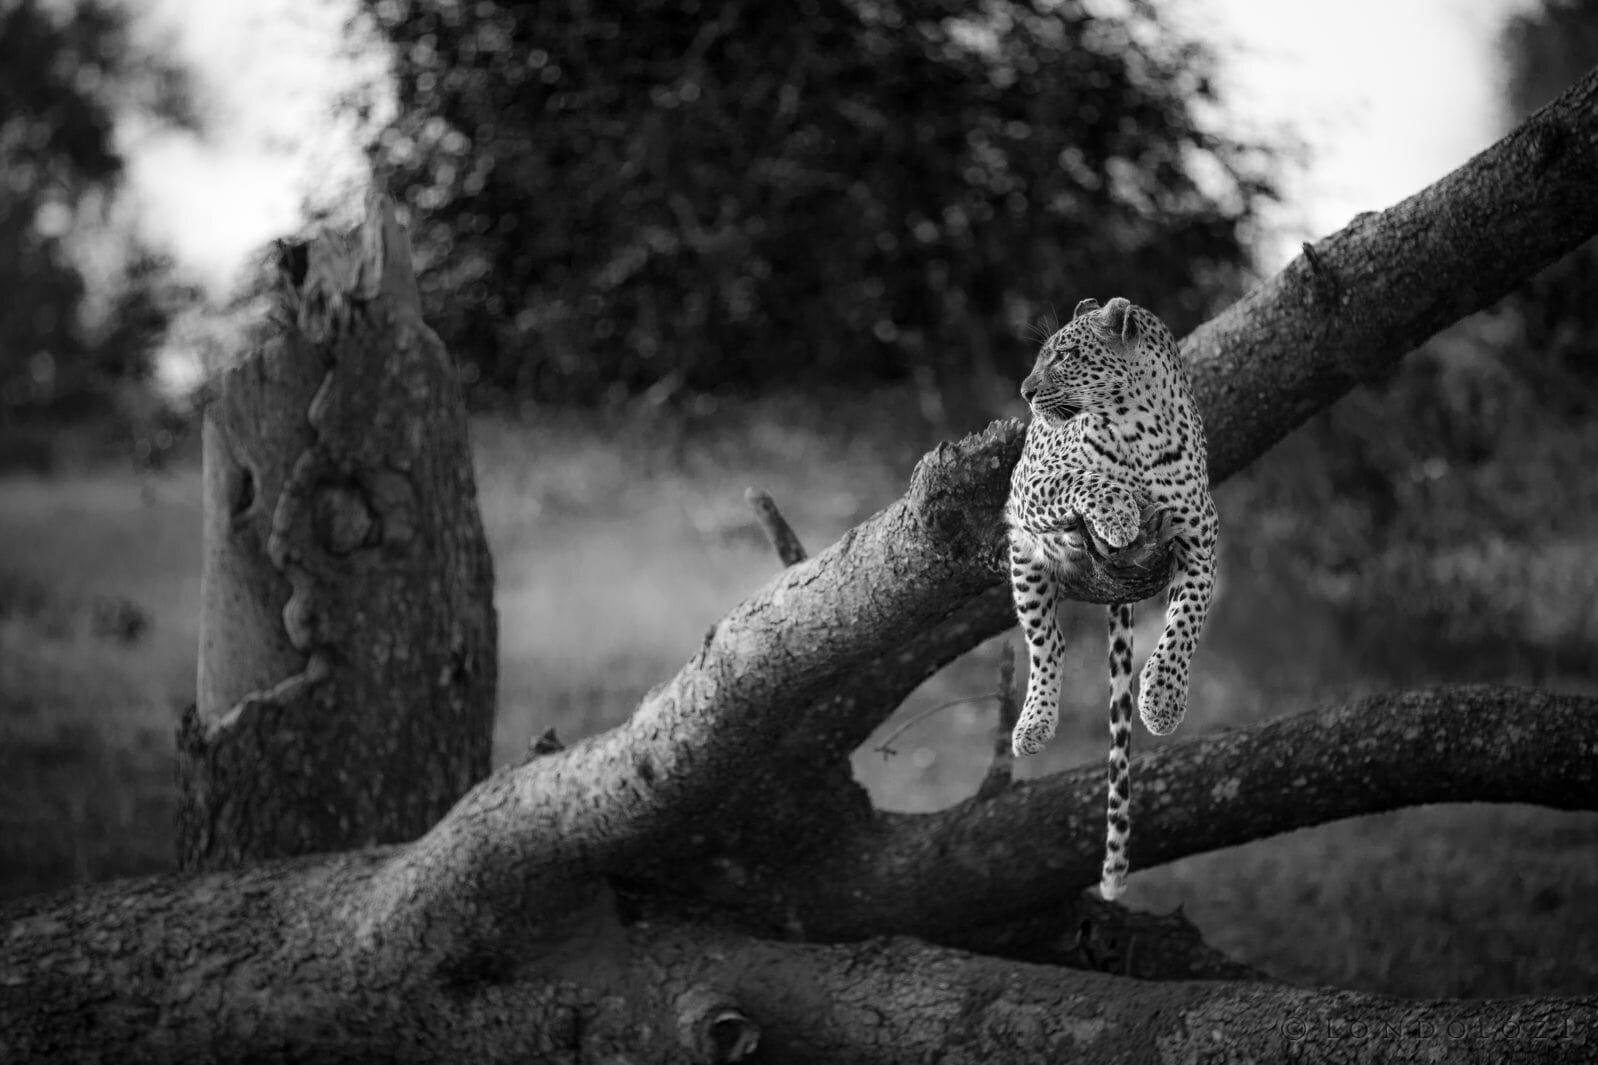 Tamboti Leopard On Fallen Tree